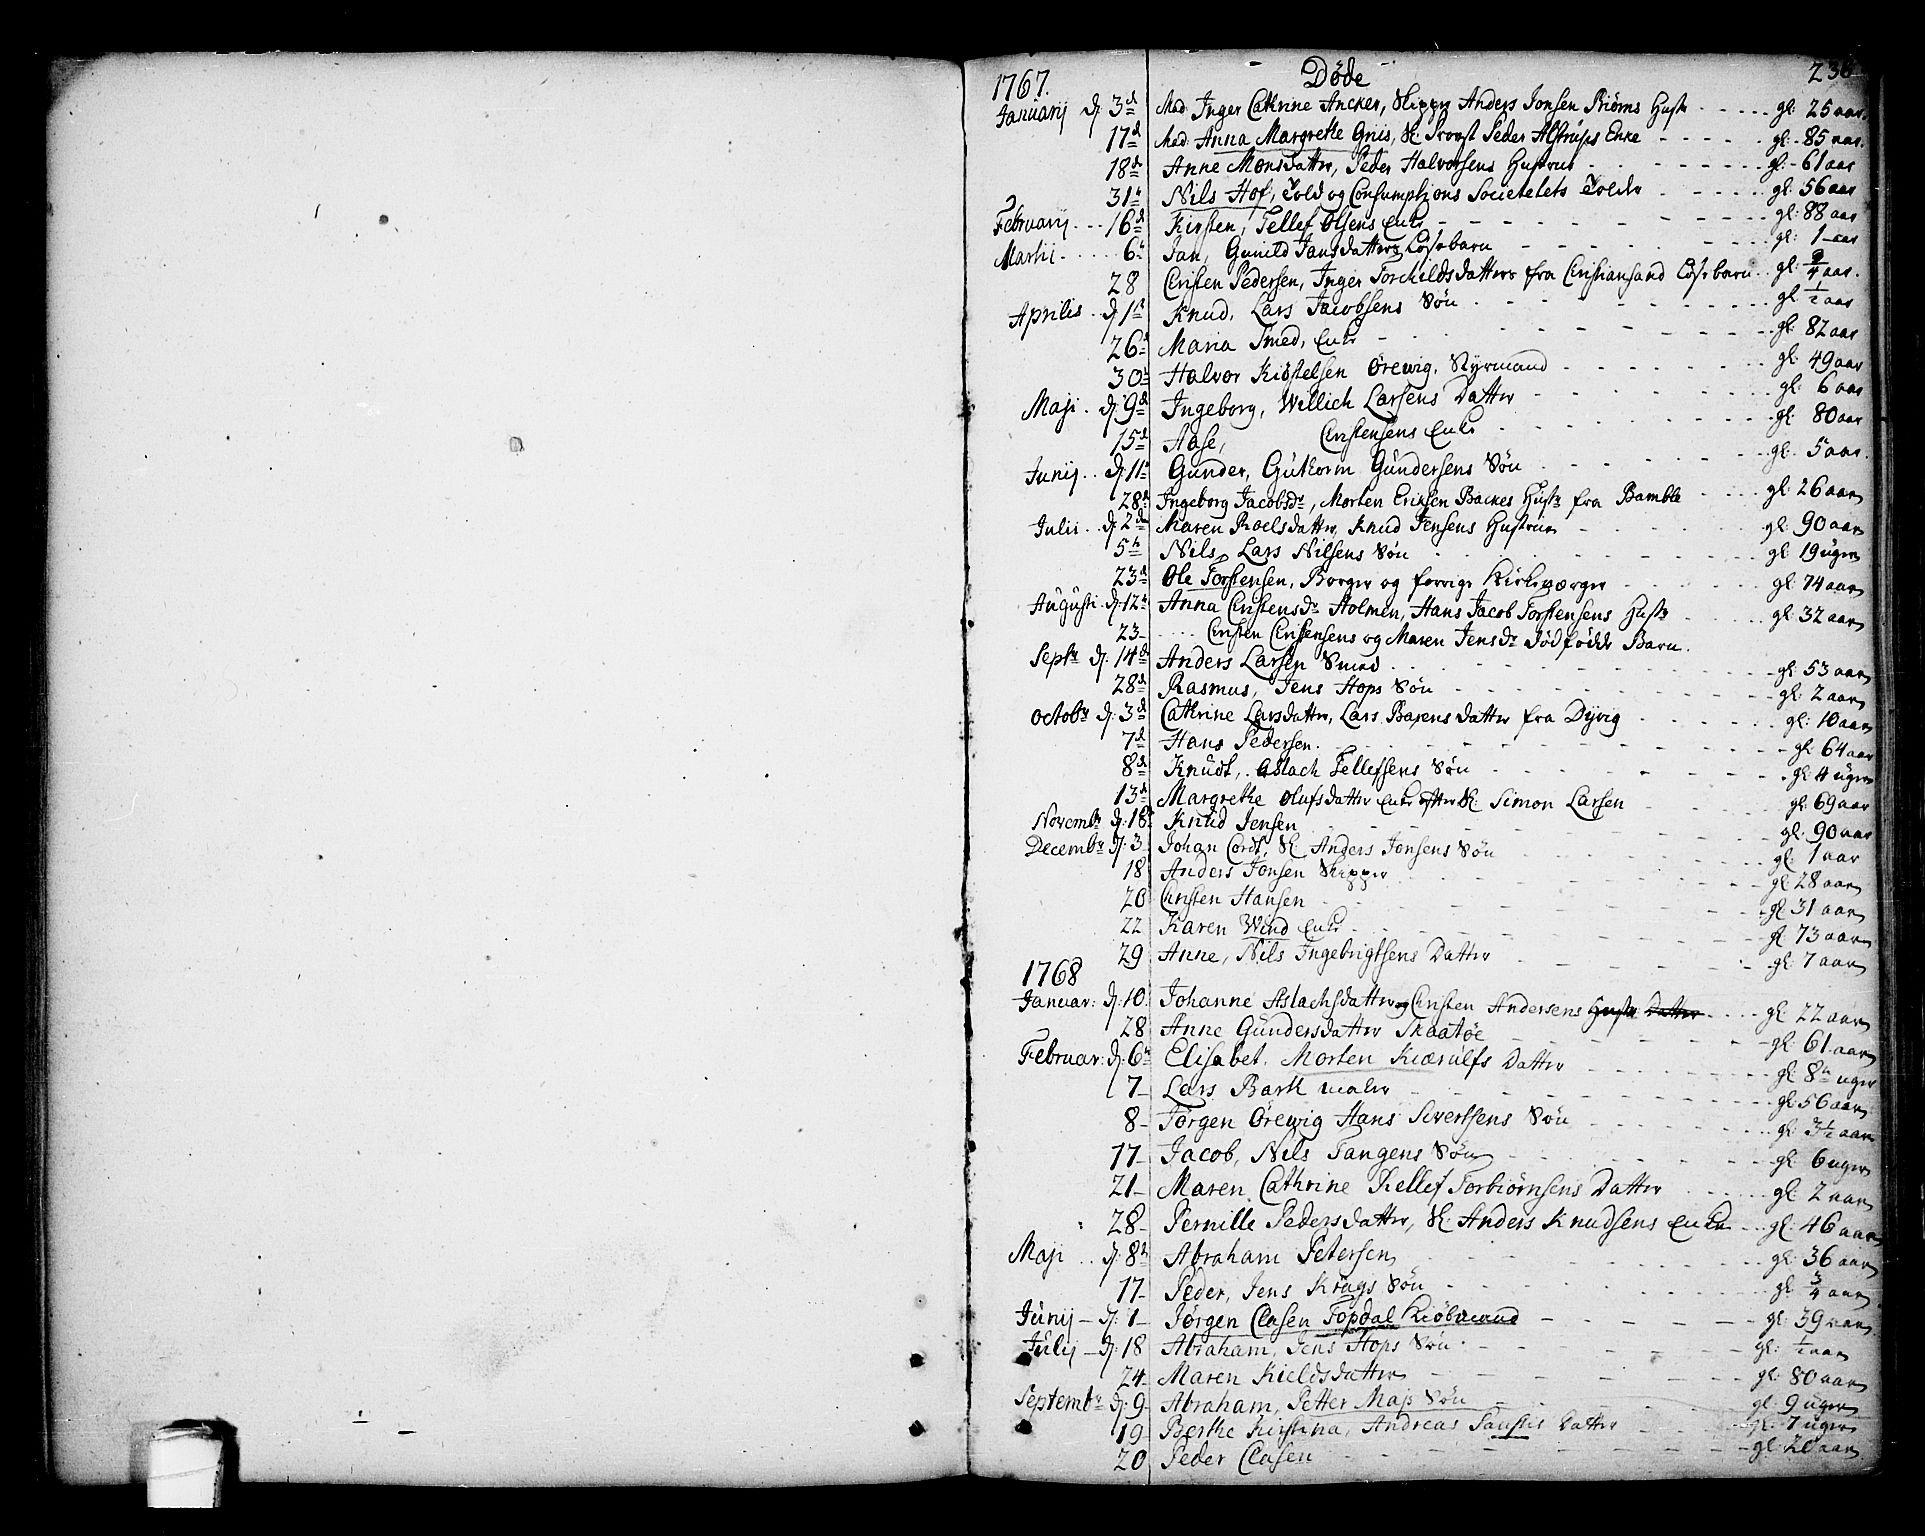 SAKO, Kragerø kirkebøker, F/Fa/L0002: Ministerialbok nr. 2, 1767-1802, s. 236